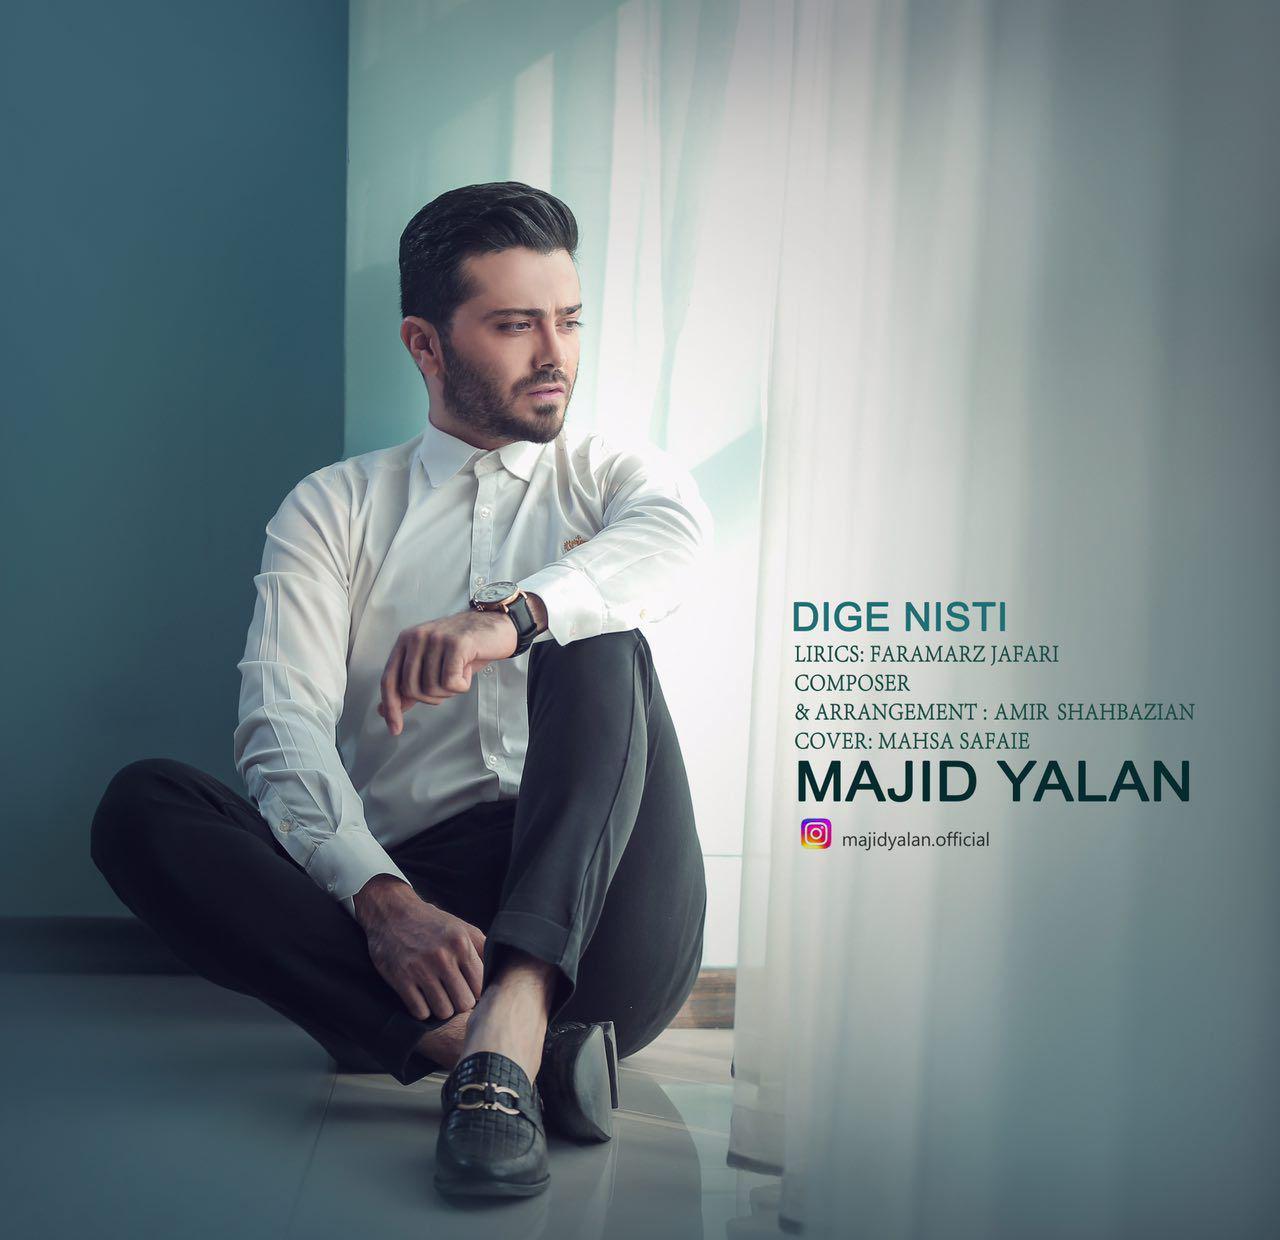 Majid Yalan – Dige Nisti